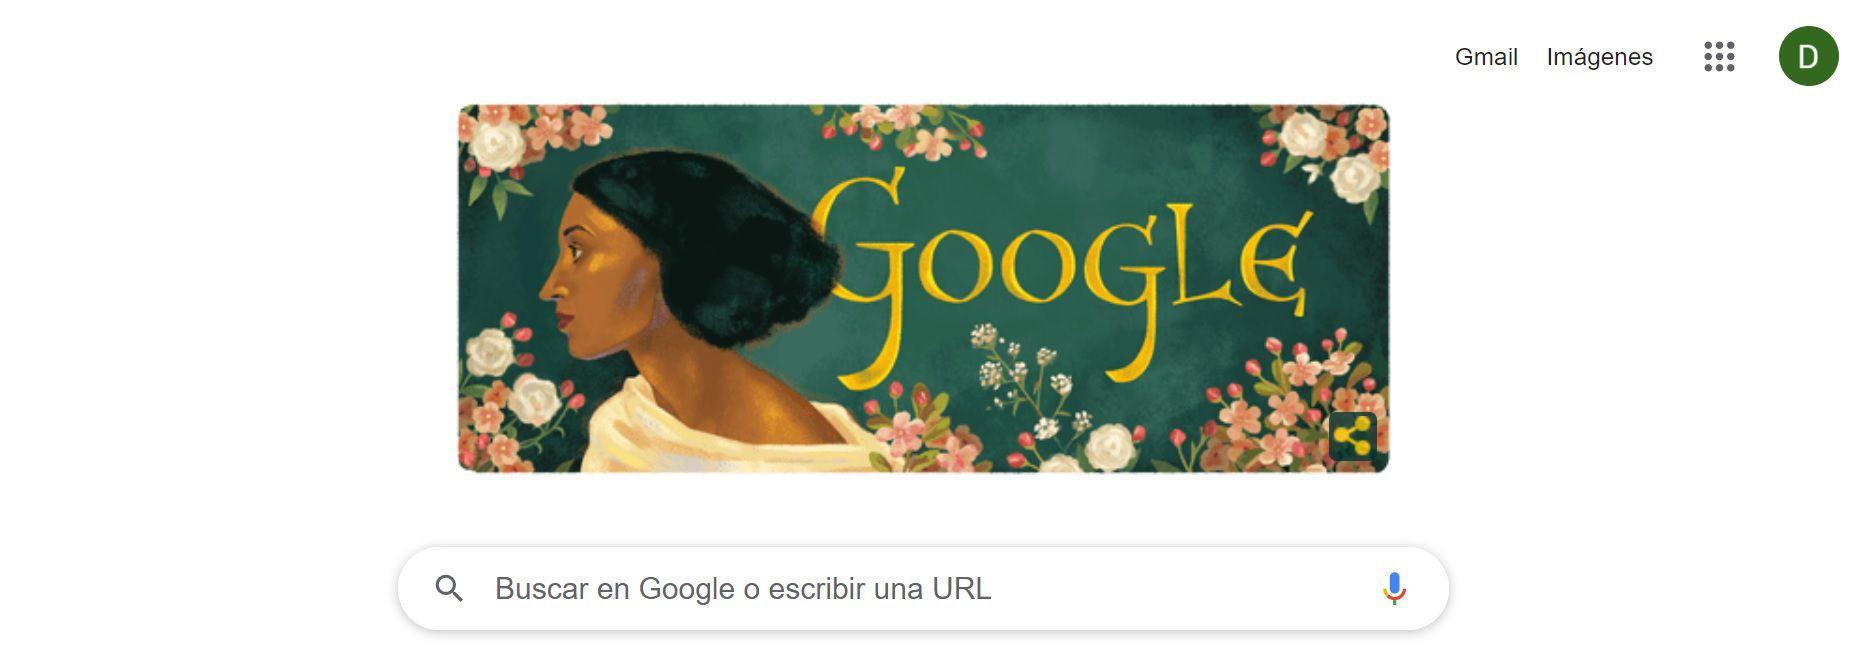 Fanny Eaton, Google Doodle